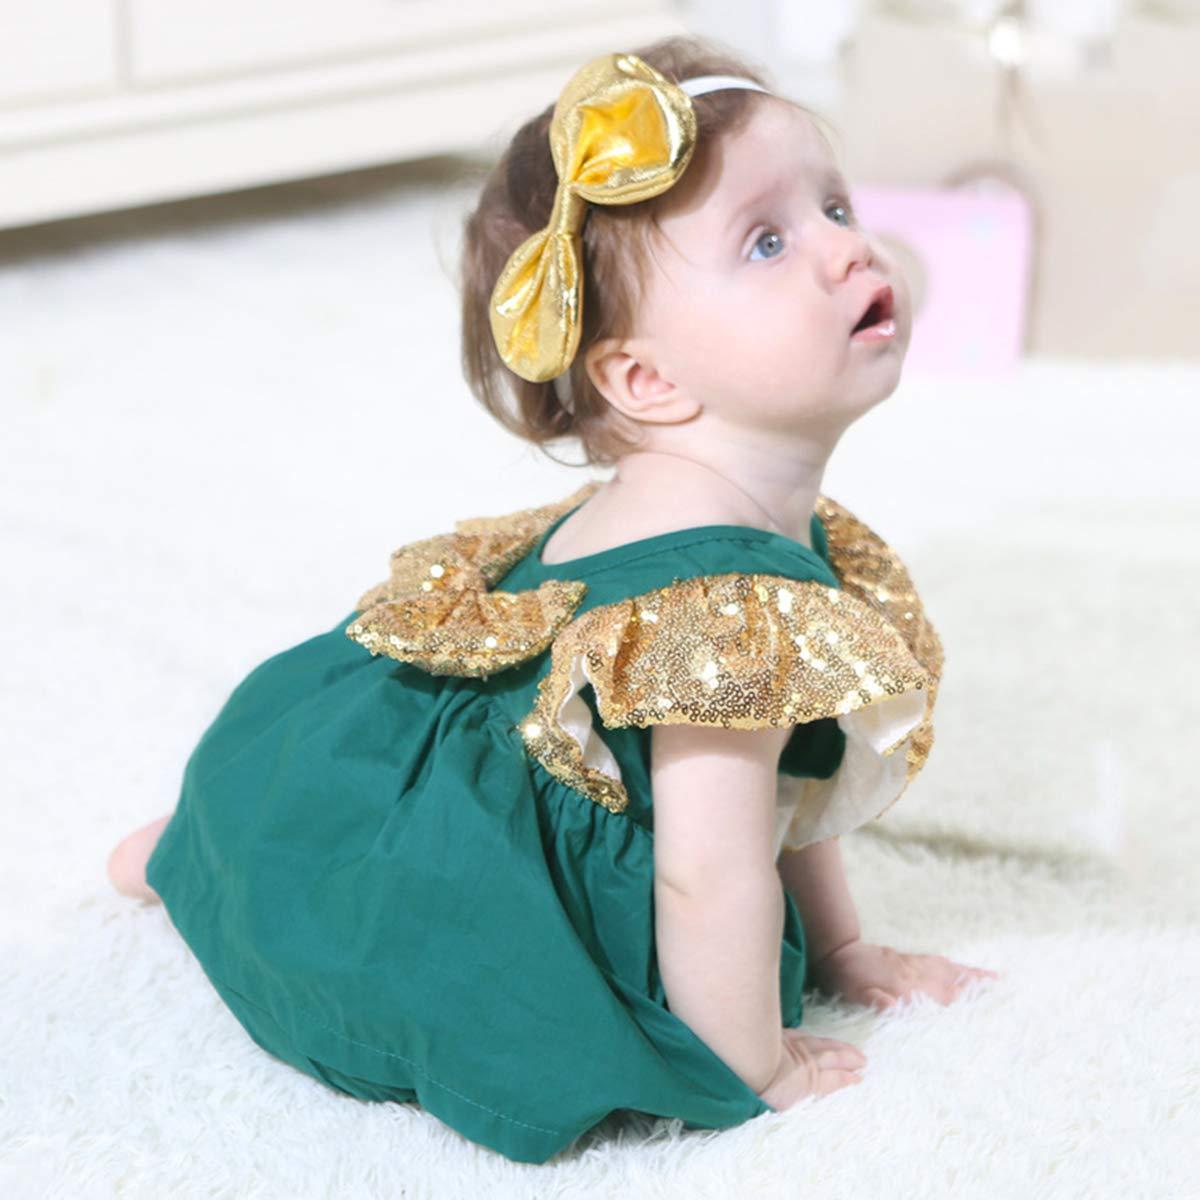 42ee00b9ab8 Amazon.com  YOHA Baby Girls Sequins Romper Bow Headband Set Newborn  Birthday Dress Outfit  Clothing